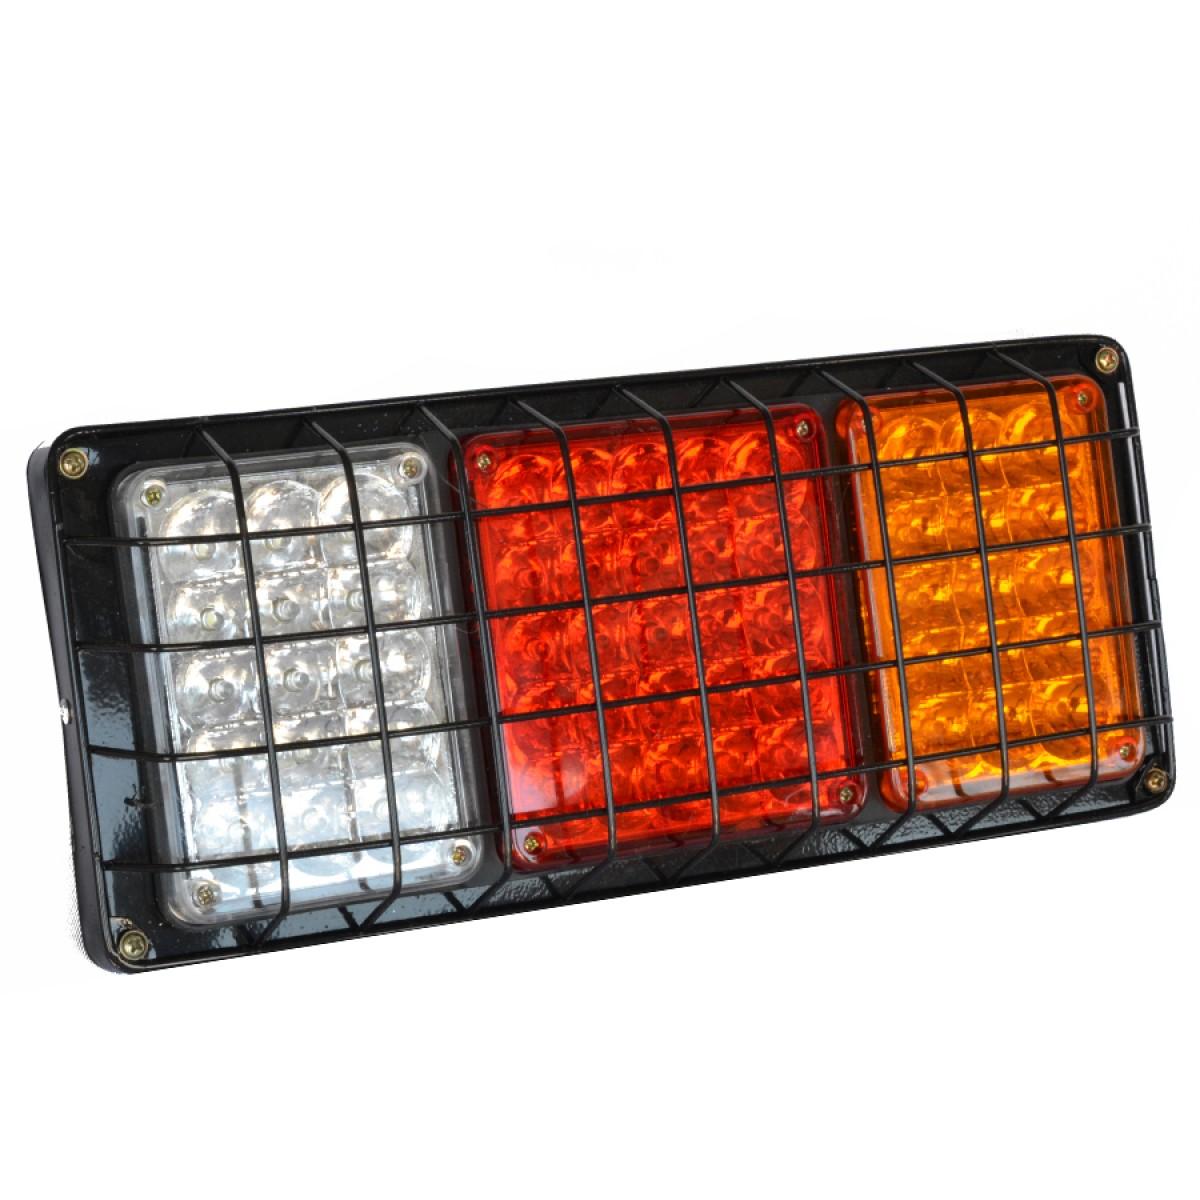 Universal φανάρι πίσω 55 LED 24V για τρακτέρ φορτηγά αυτοκίνητα (όπισθεν, πορεία-στοπ, φλας)